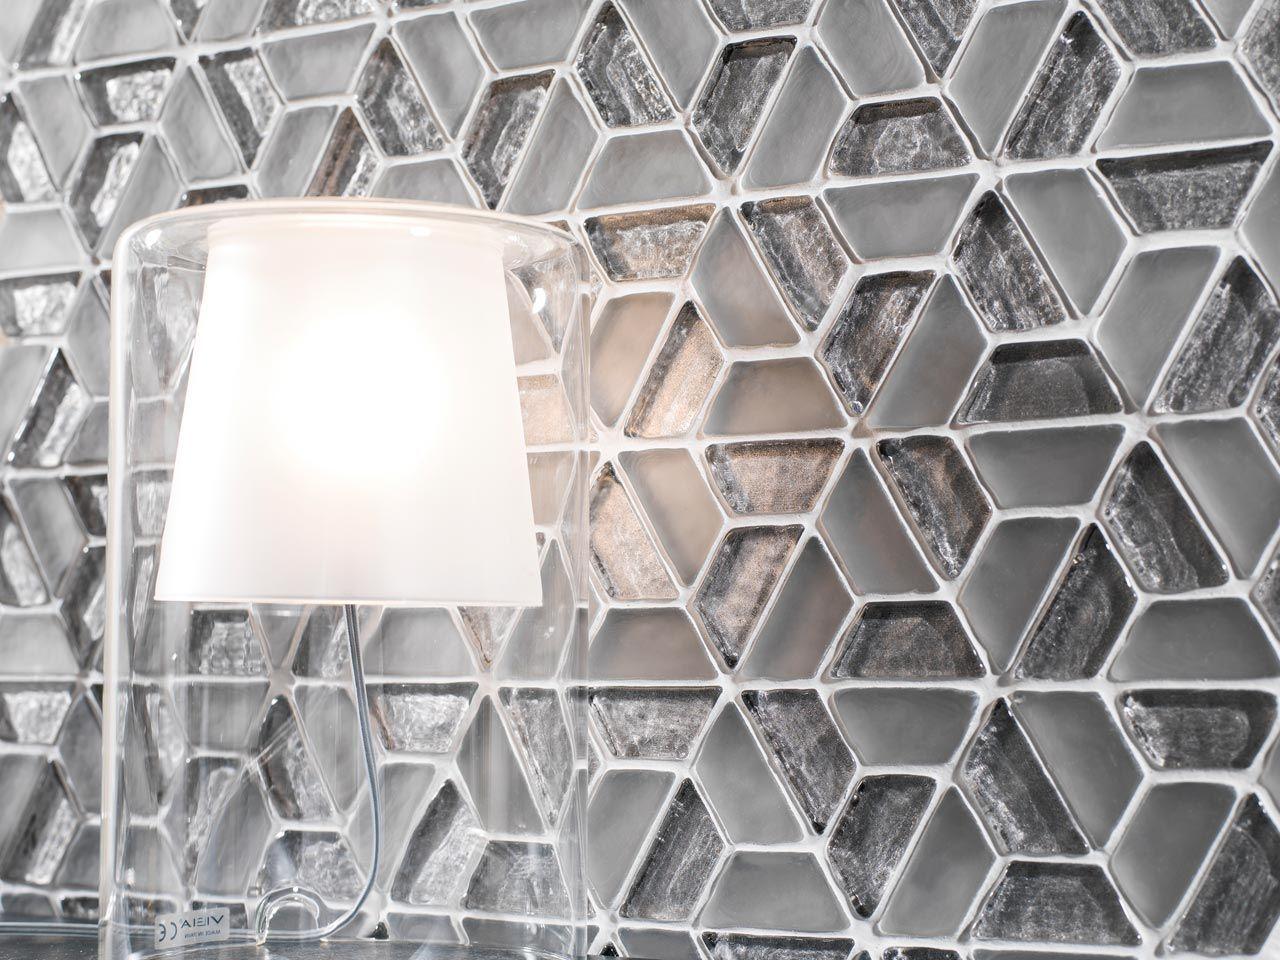 3d models bathroom accessories ceramic tiles venis artis - Evoke Form Silver 25 7 X 14 8 X 0 85 Cm